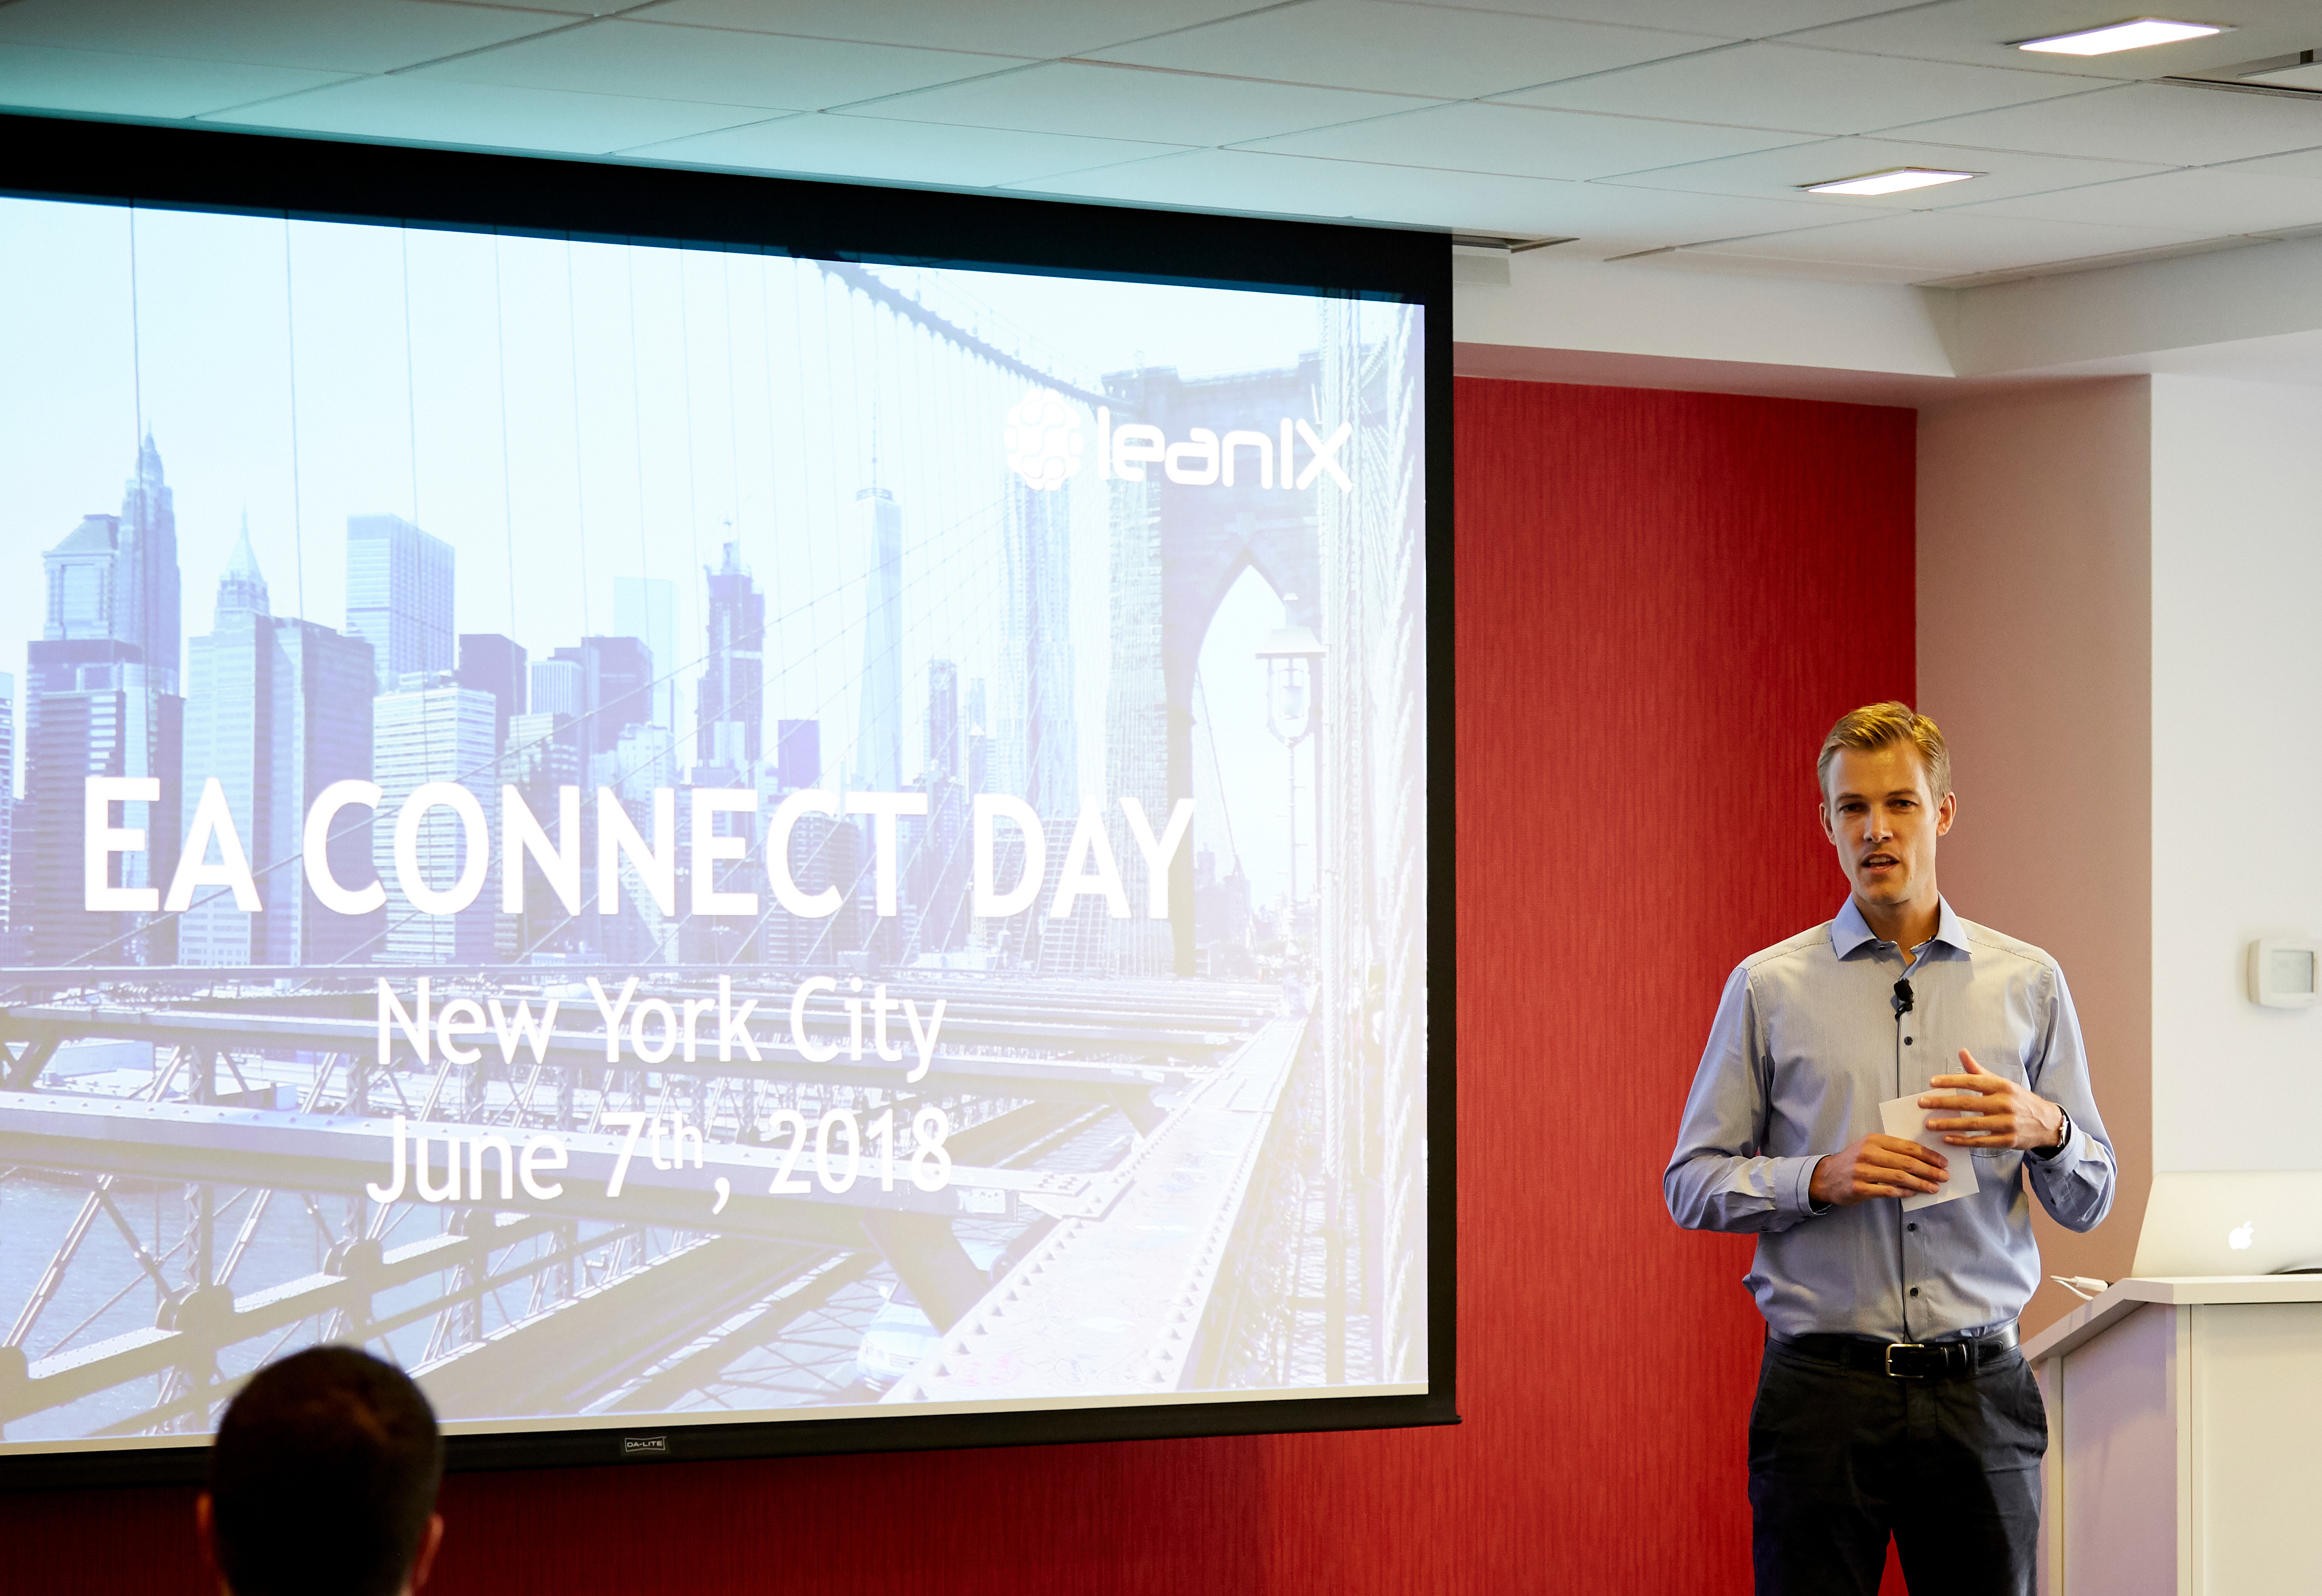 Enterprise Architect Connect Day United States LeanIX